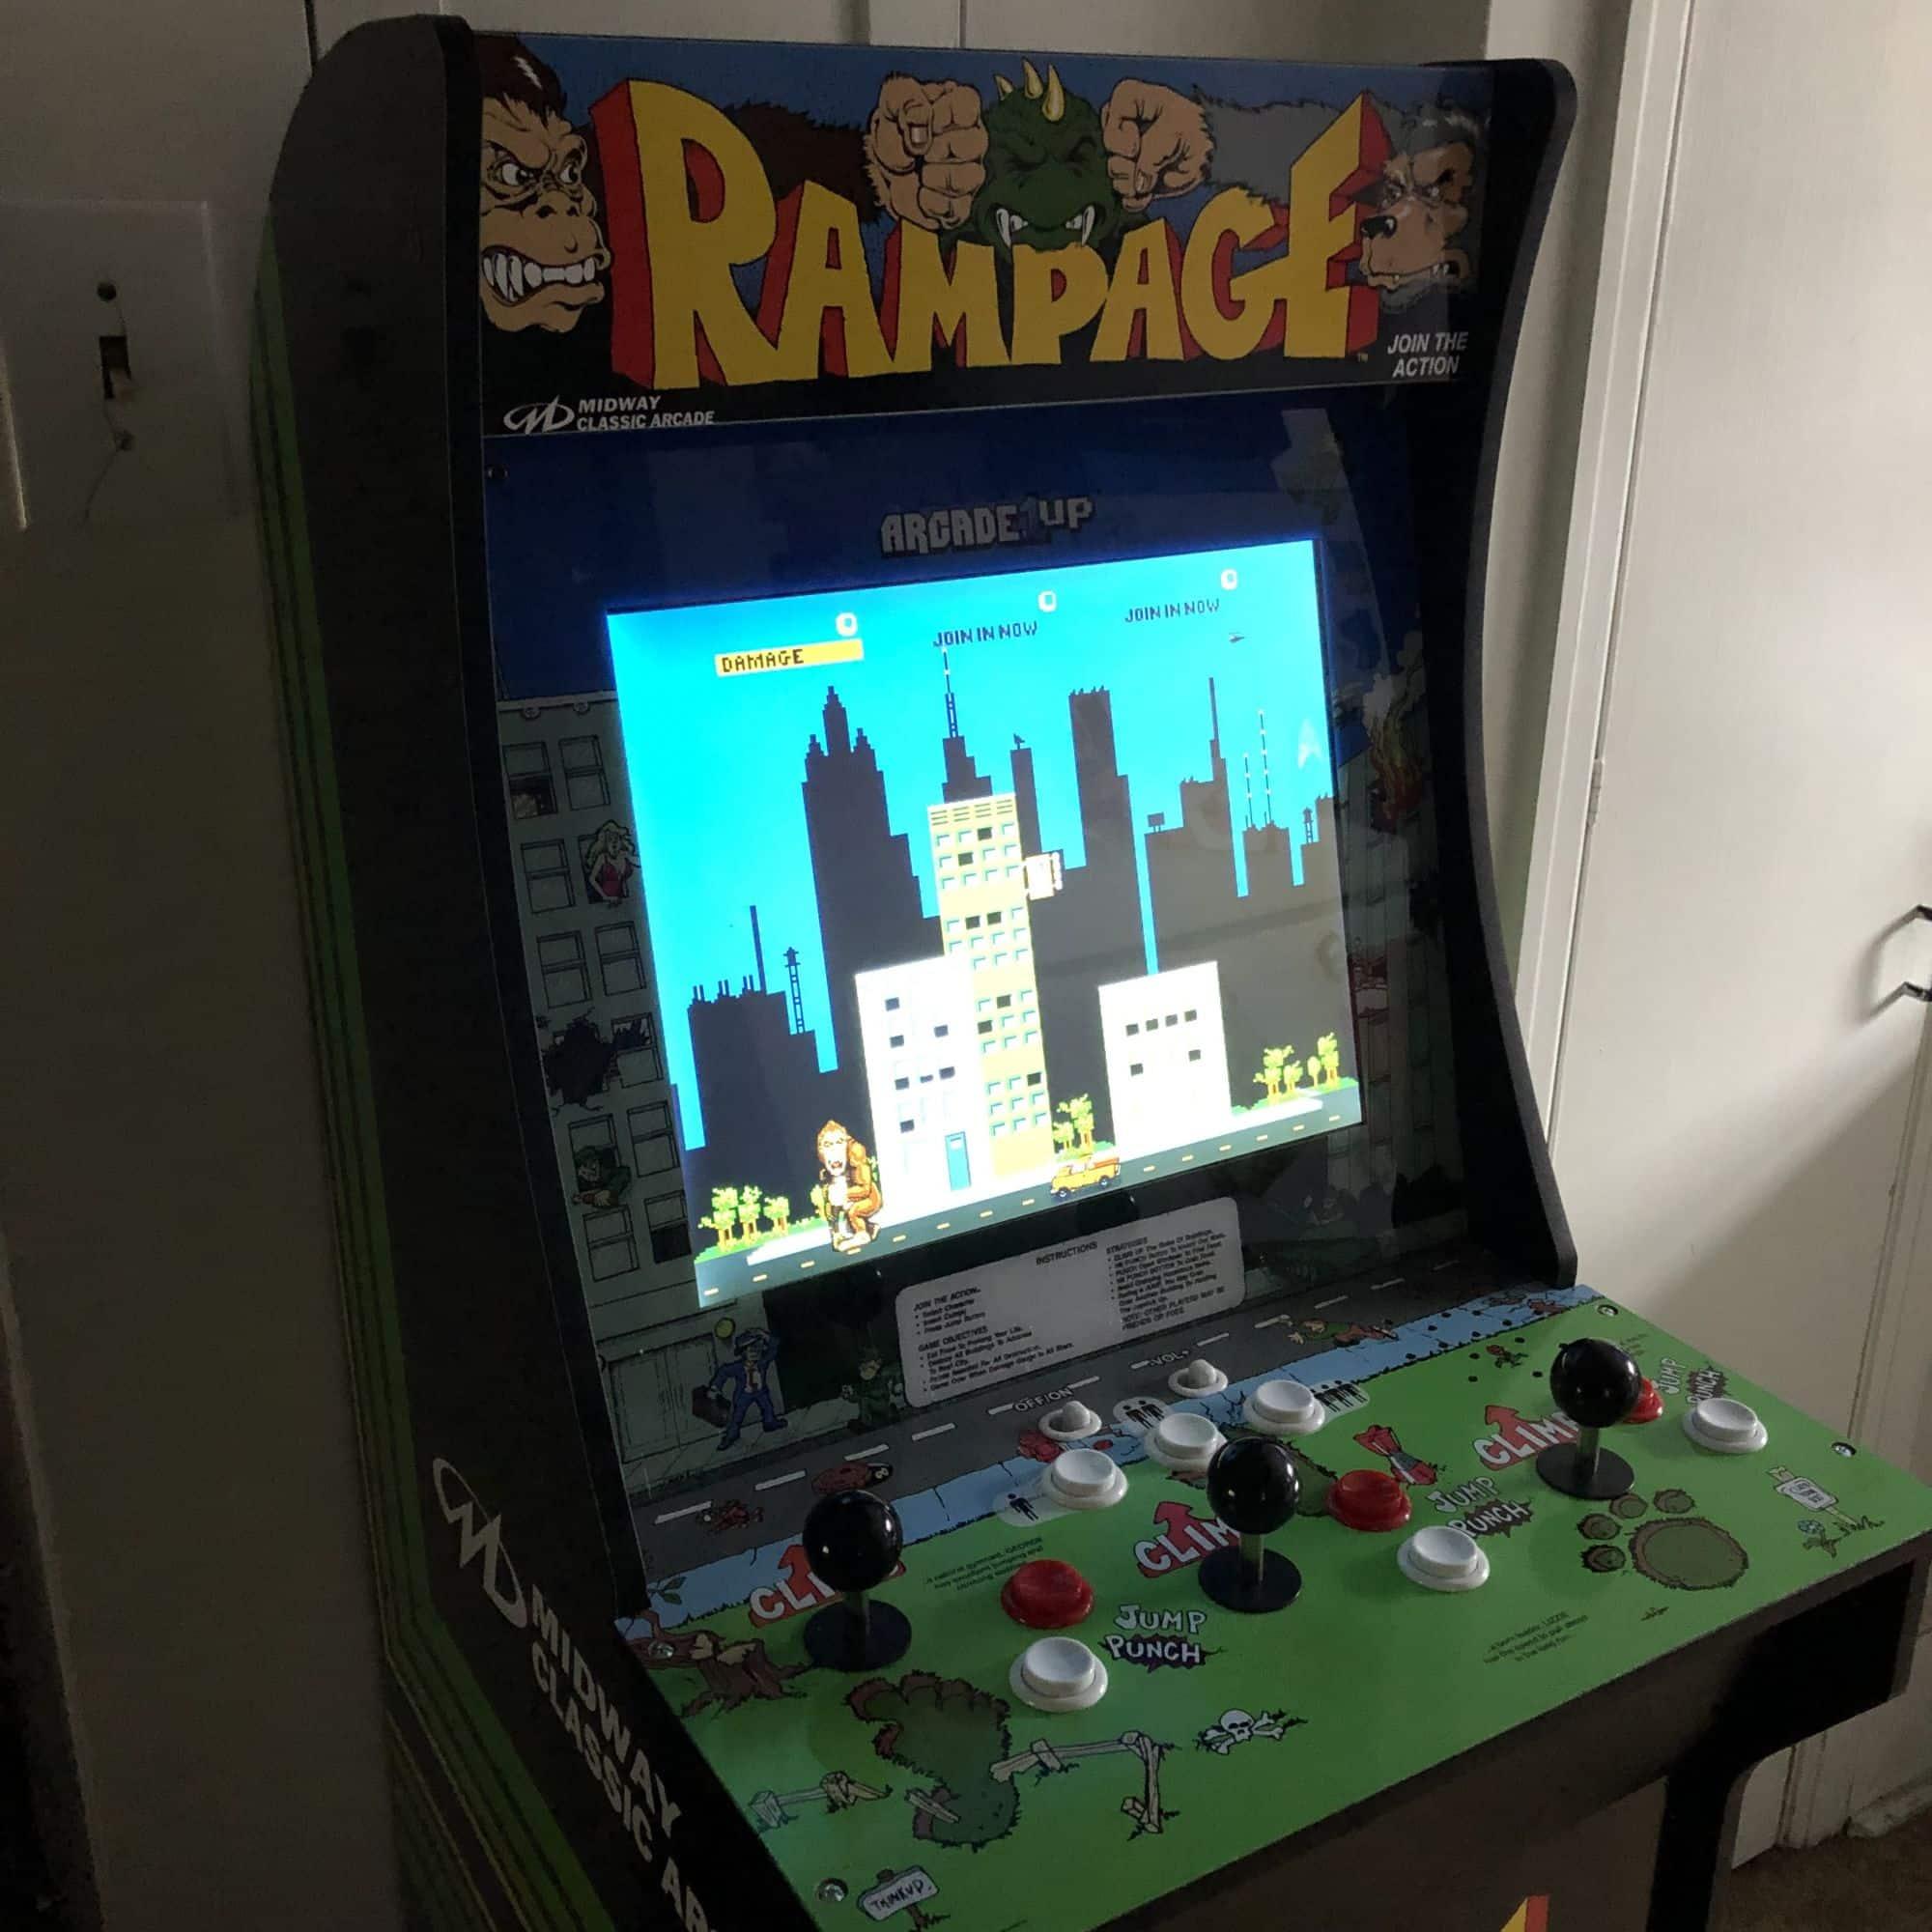 Review: Arcade1Up Rampage Arcade Cabinet